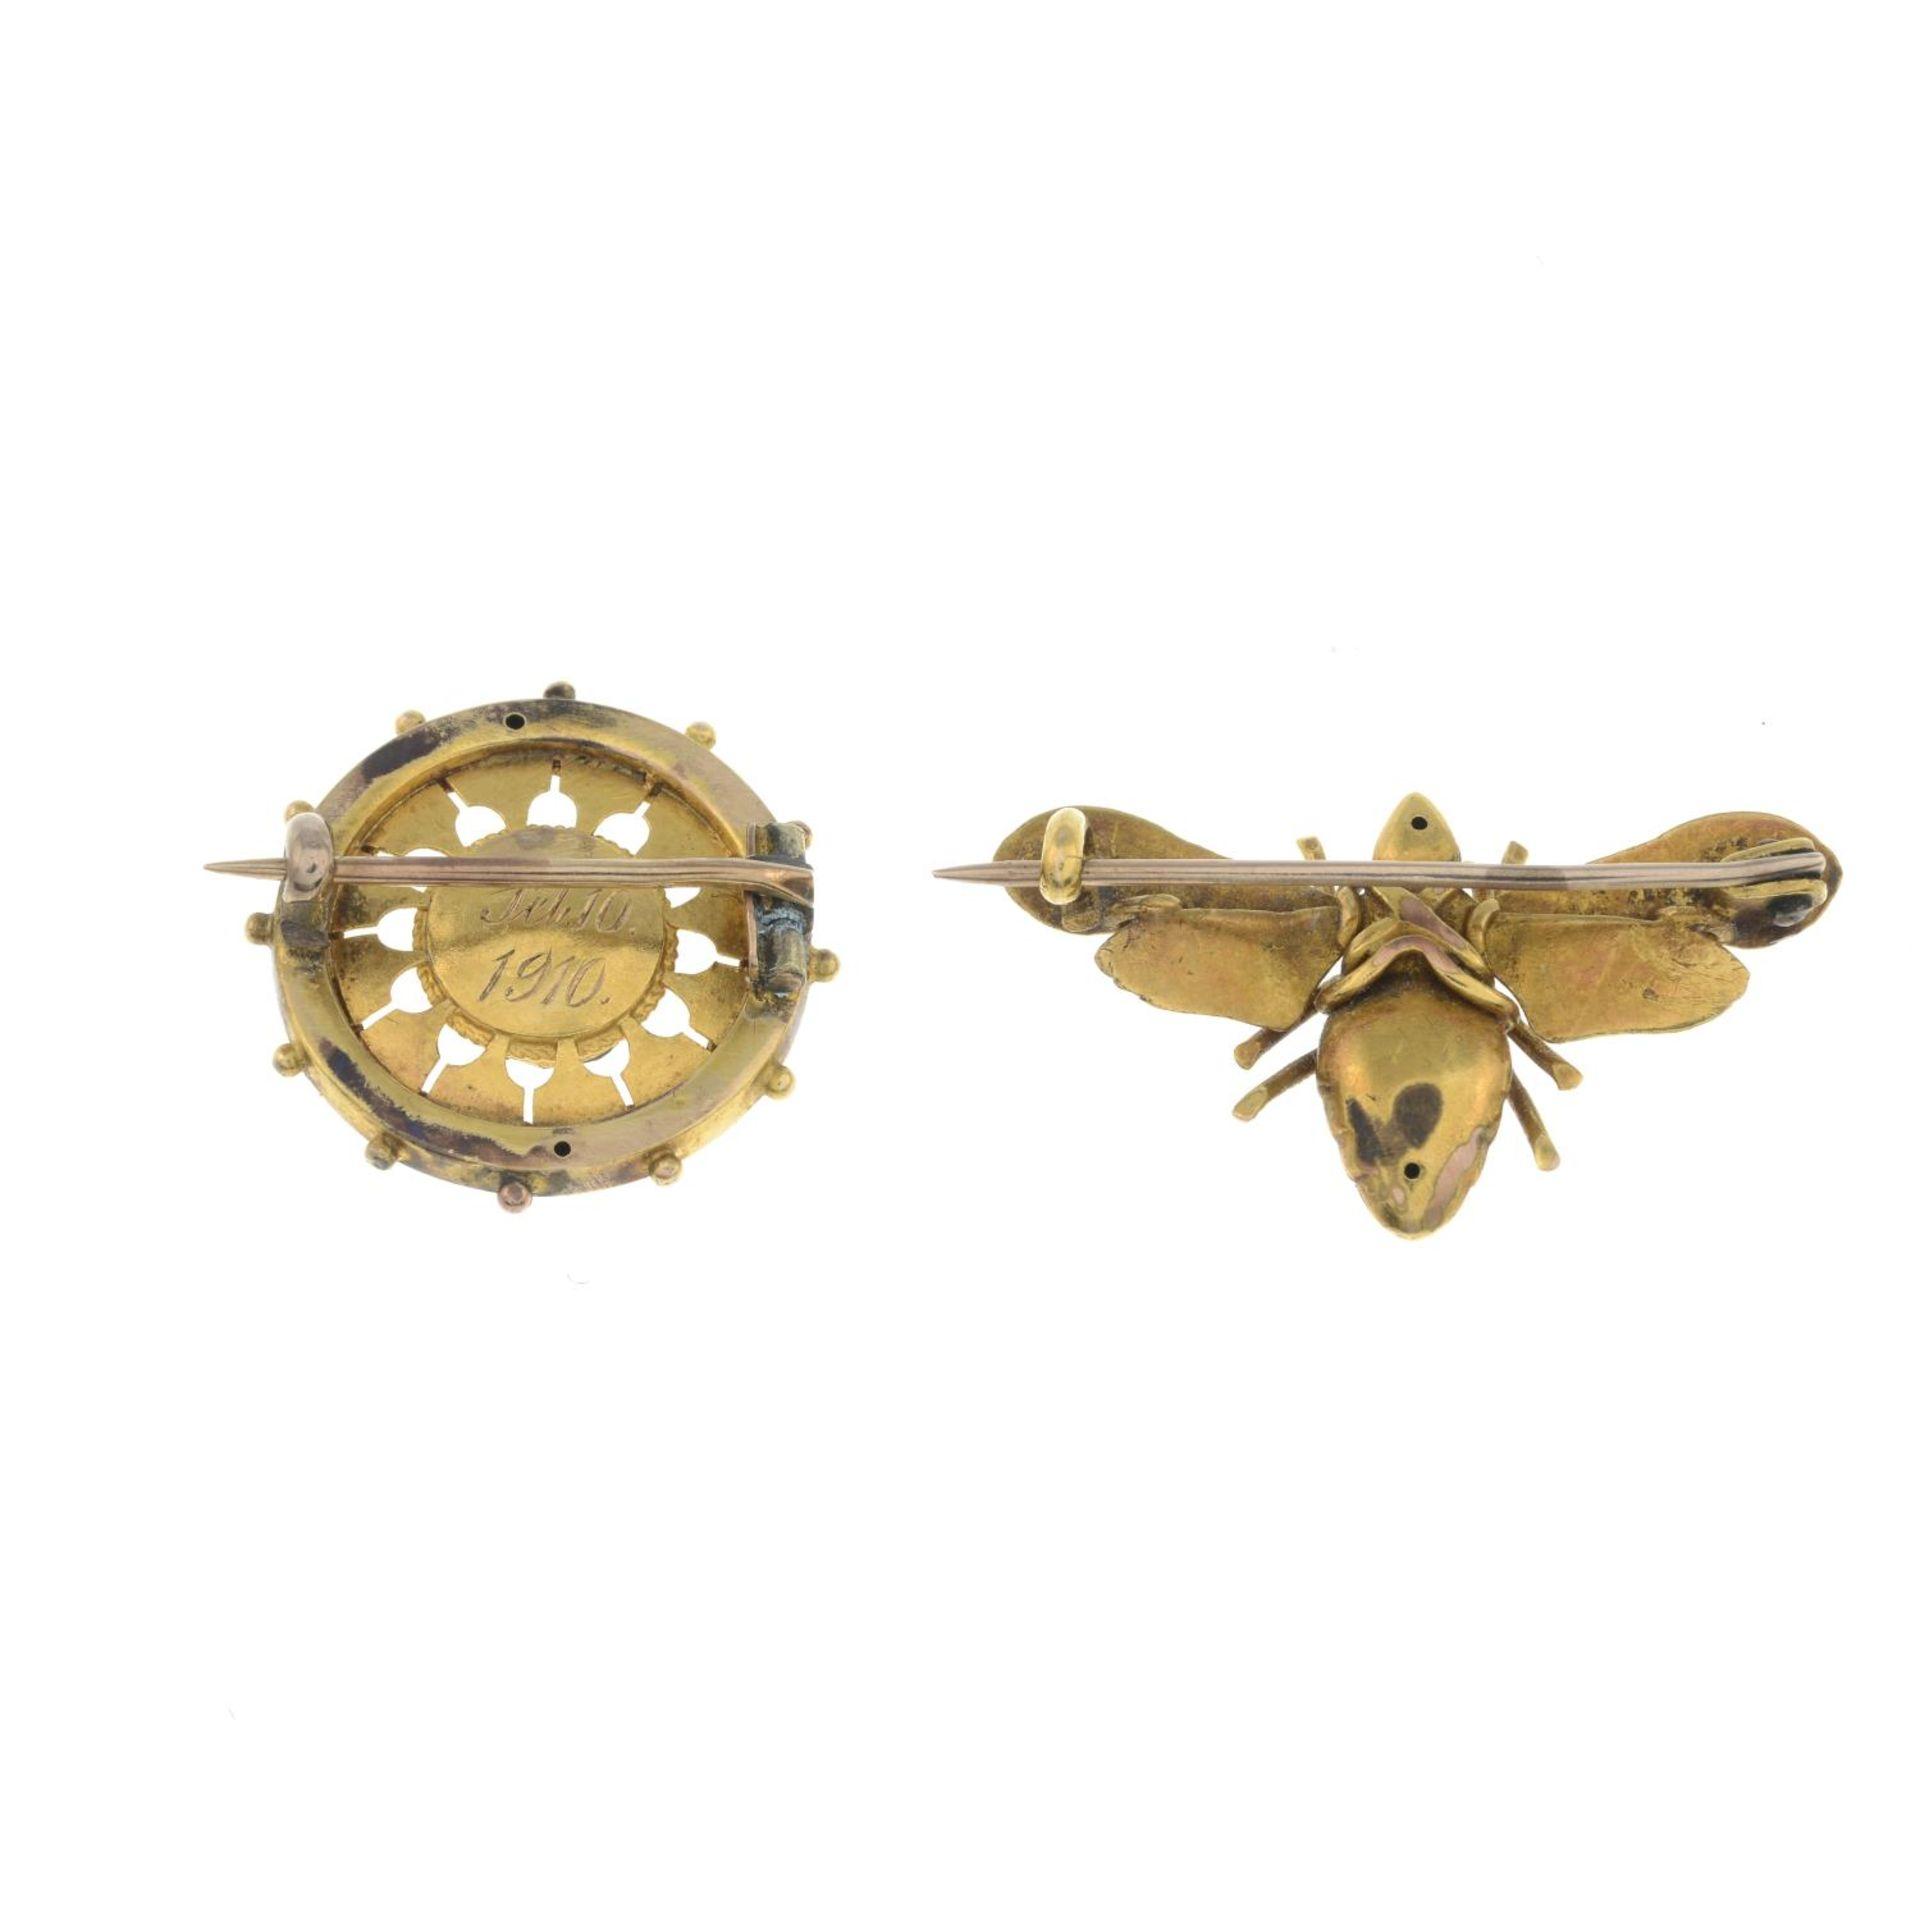 Edwardian gold pyrite circular brooch, - Bild 2 aus 2